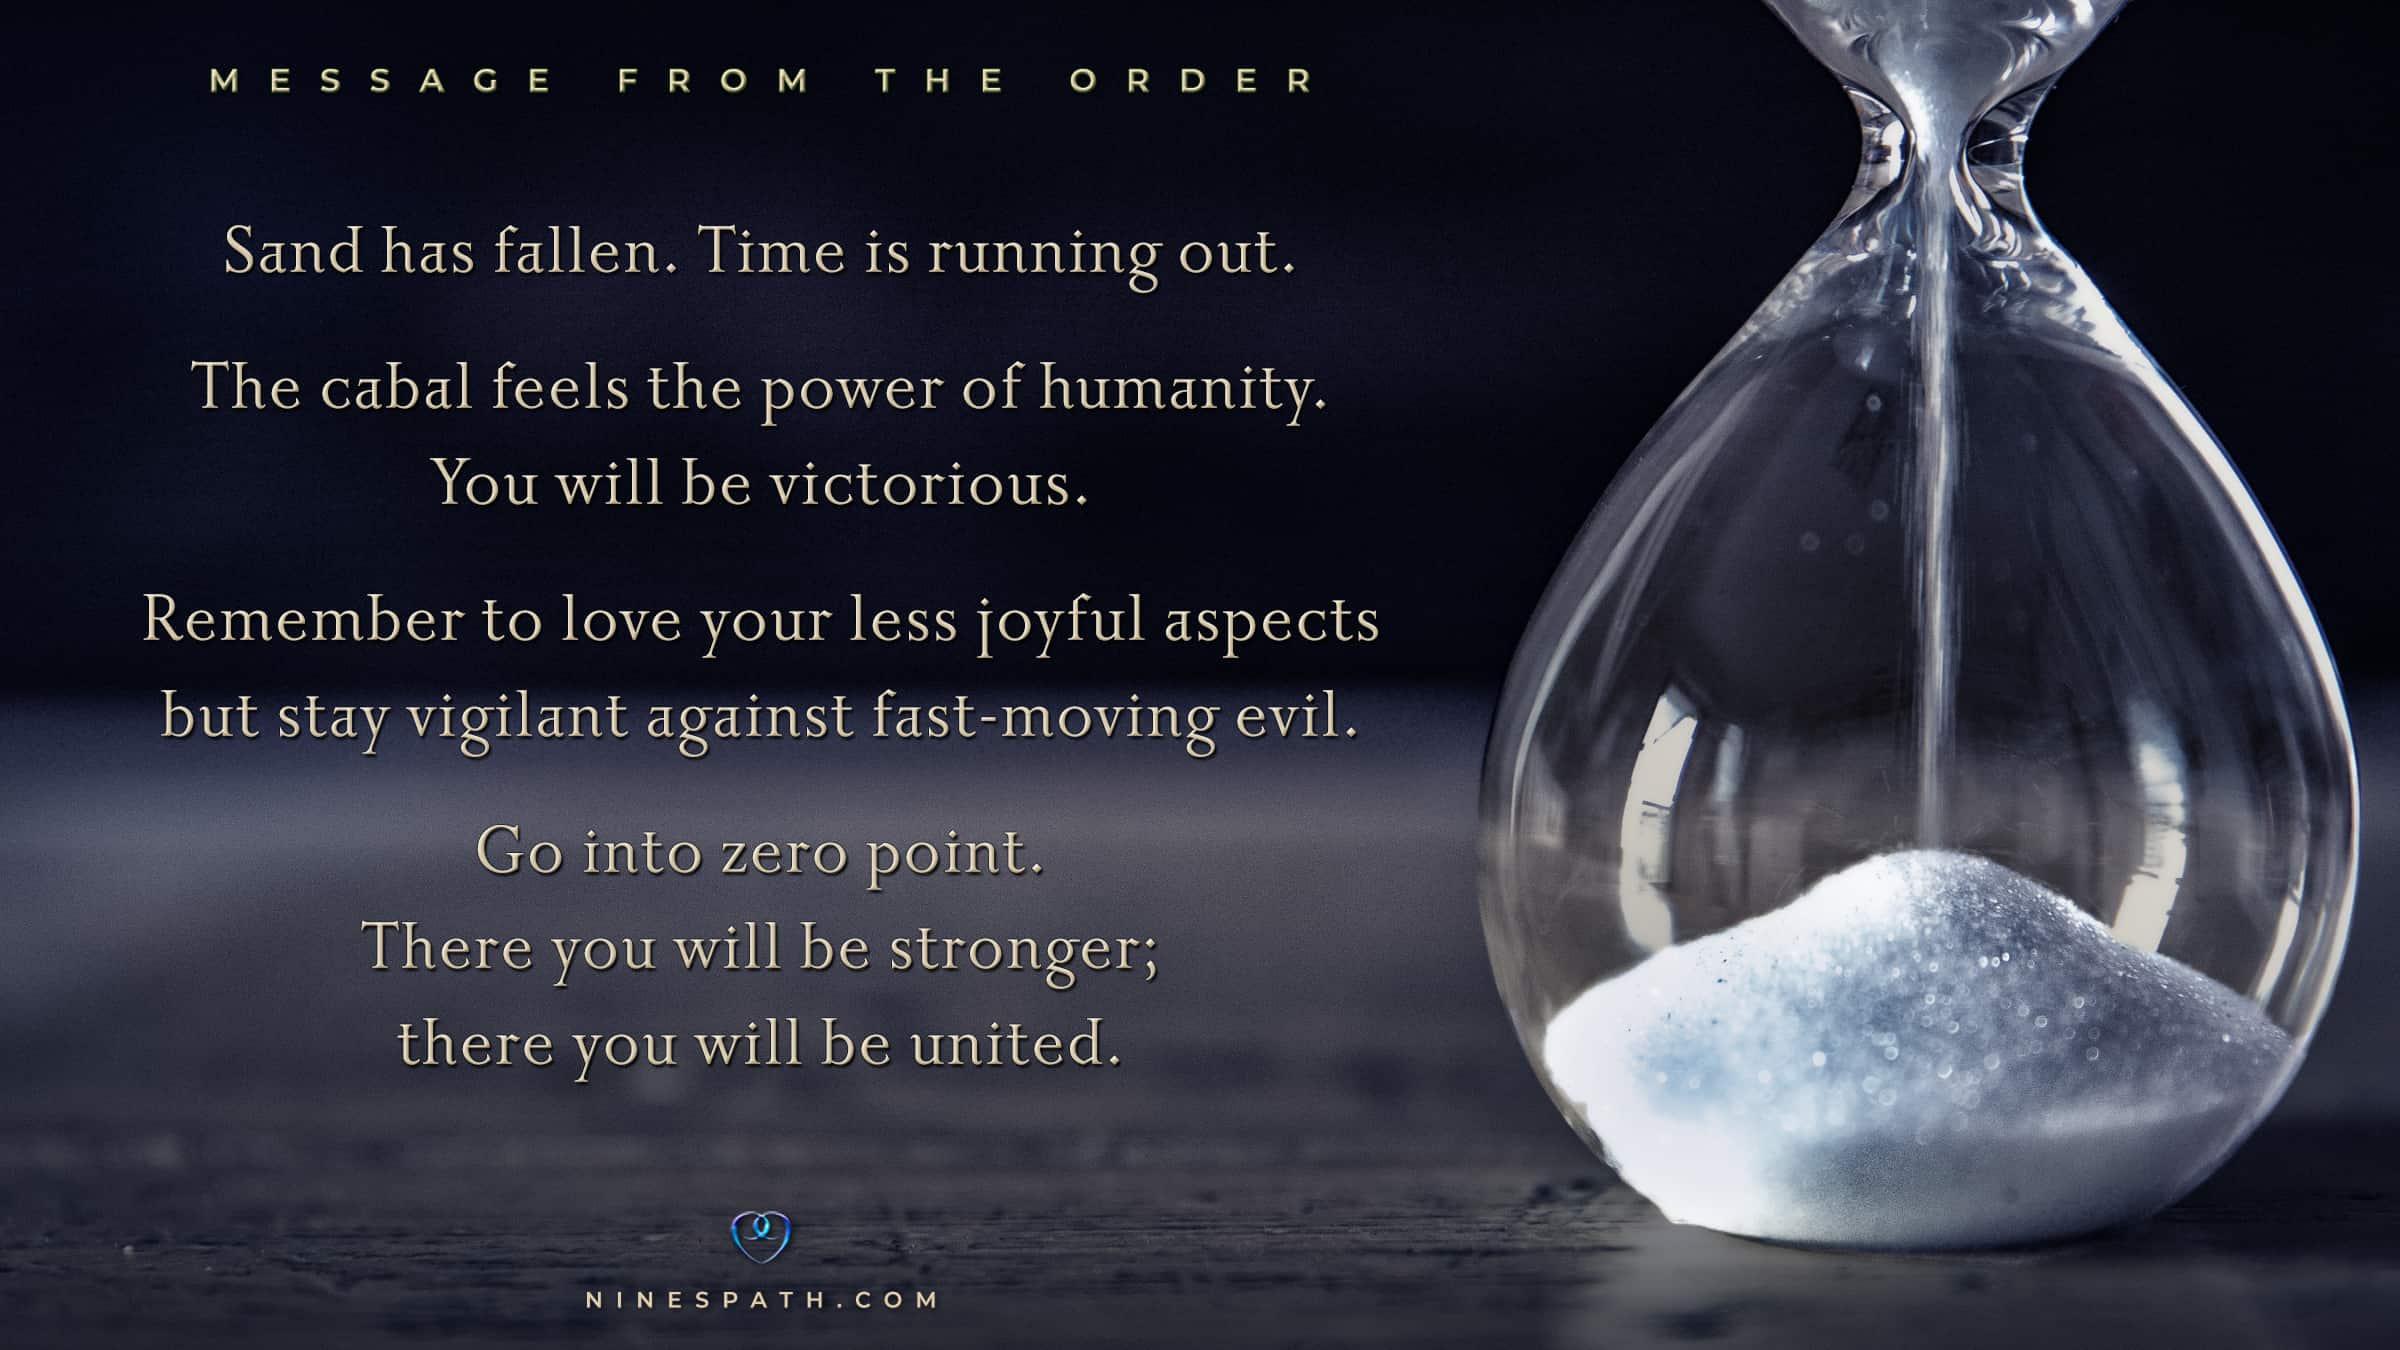 Nine's Path Order divine